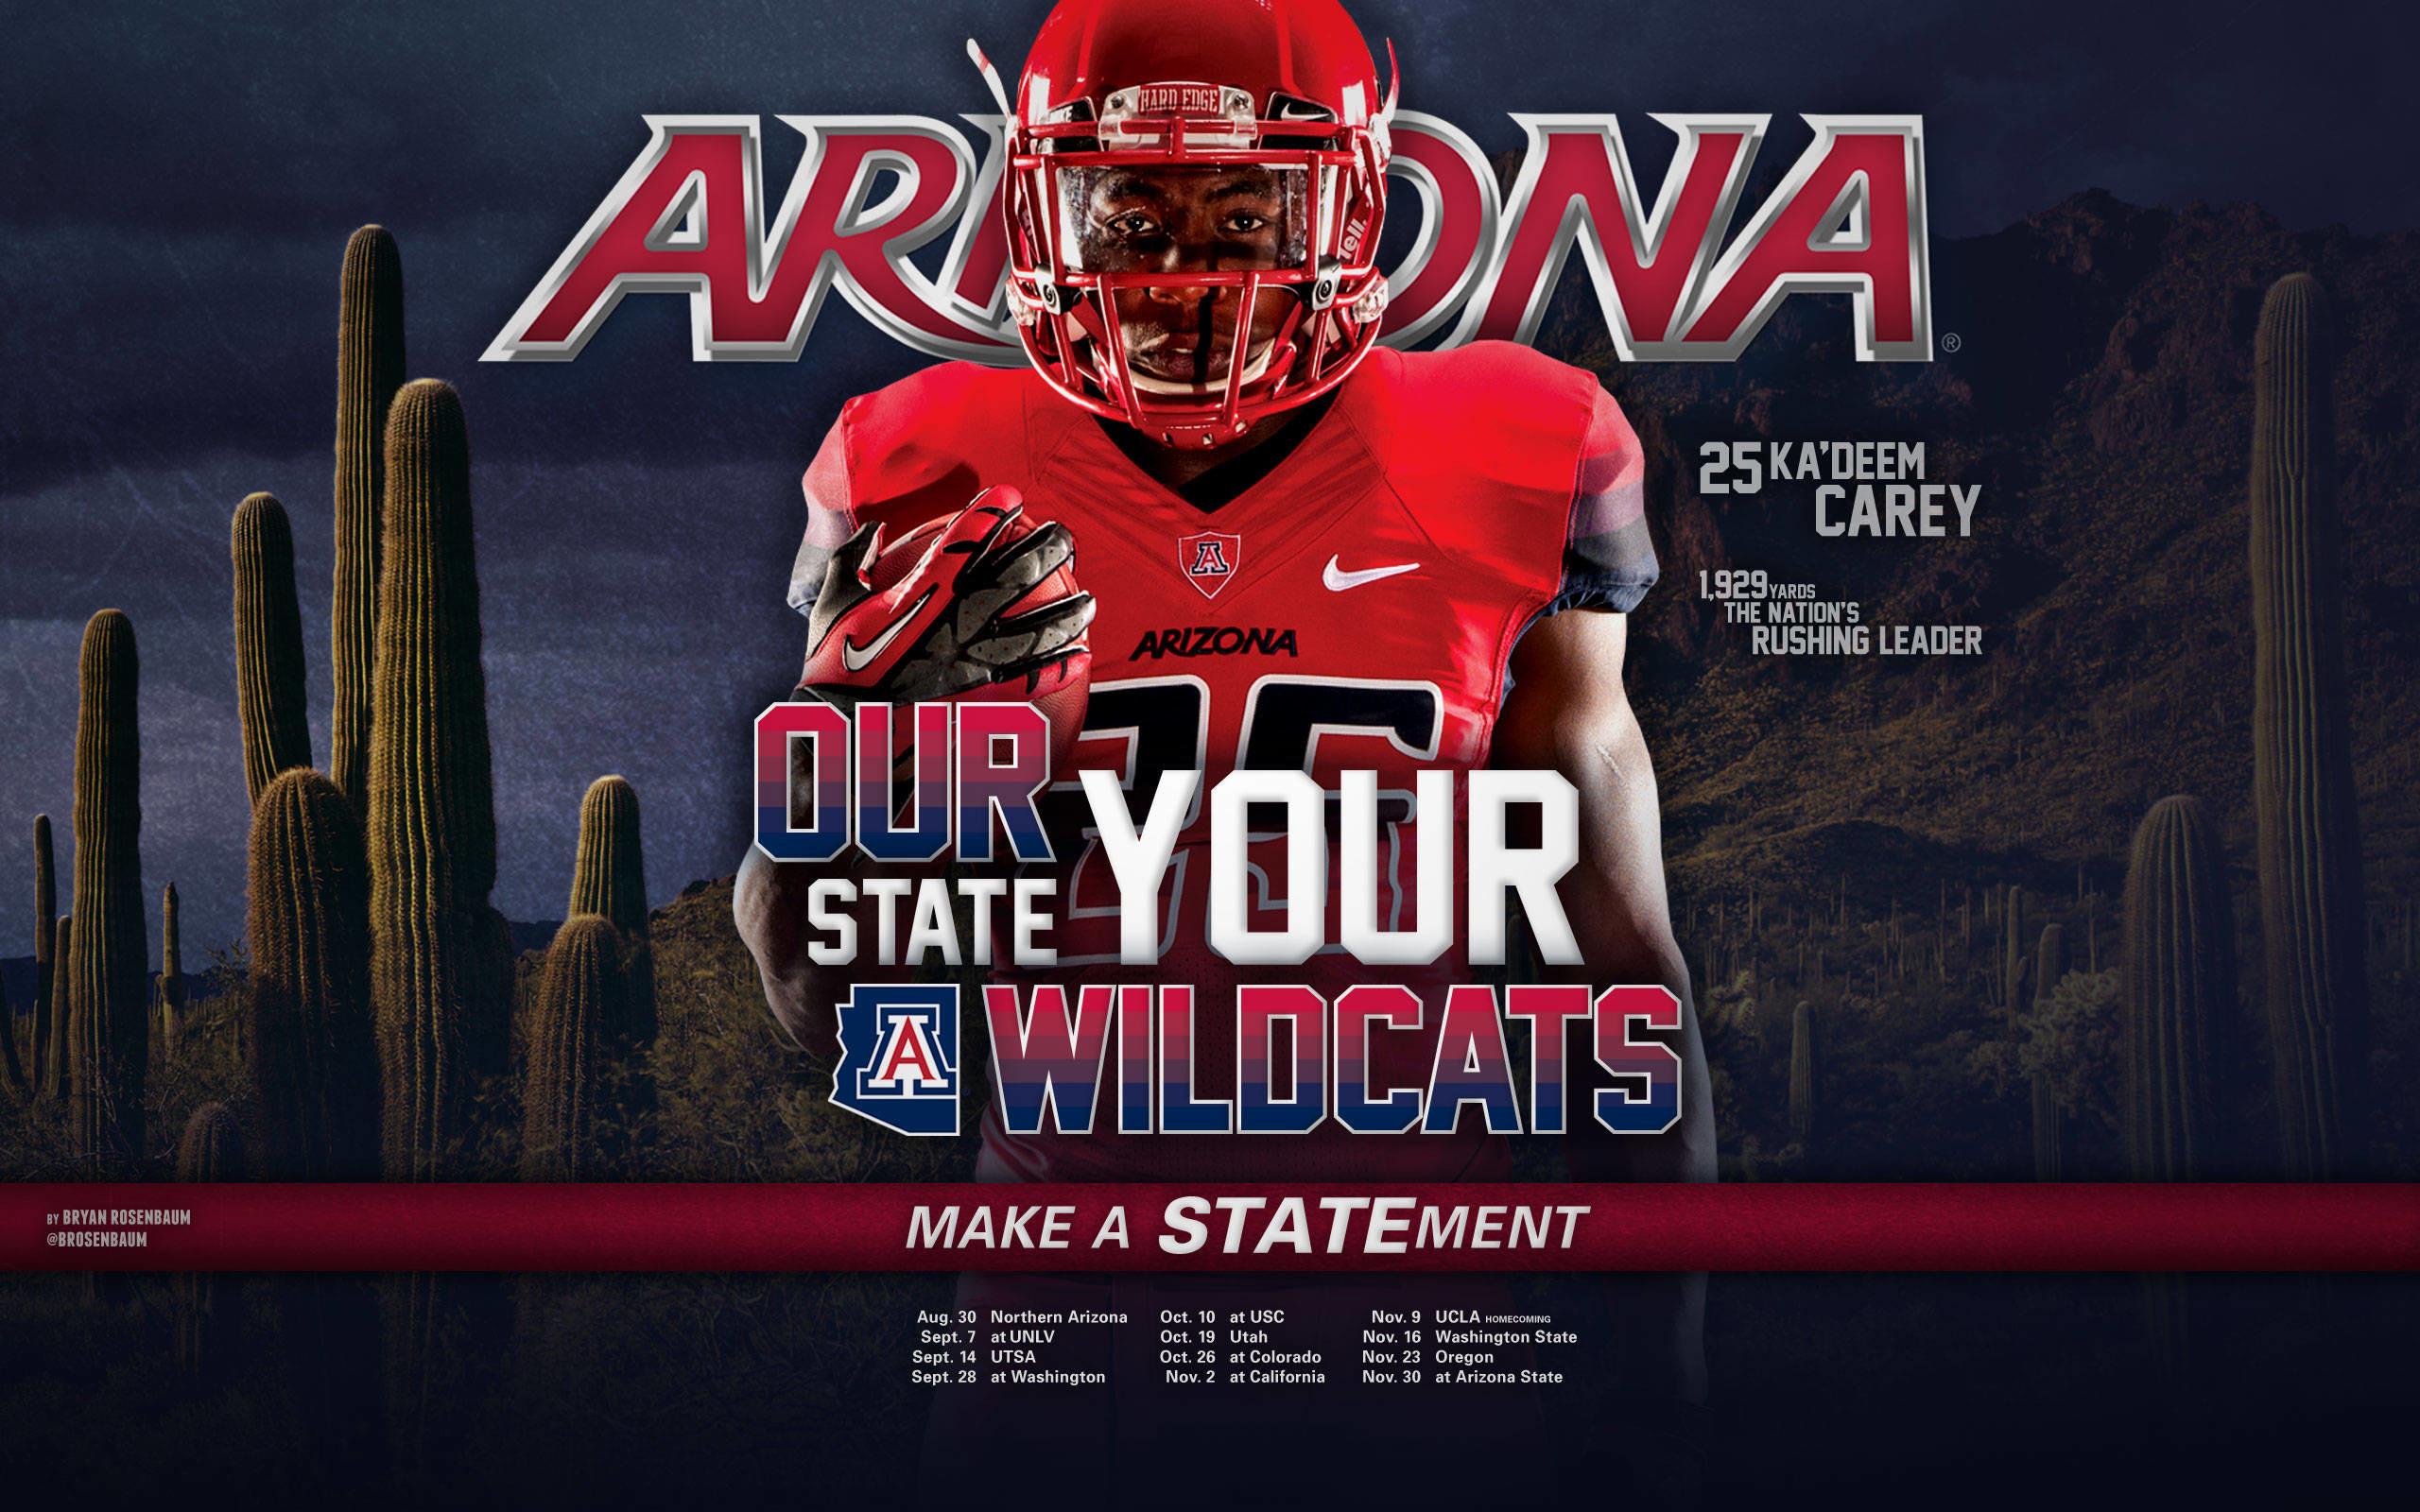 2013 Arizona Football Wallpapers – The University of Arizona